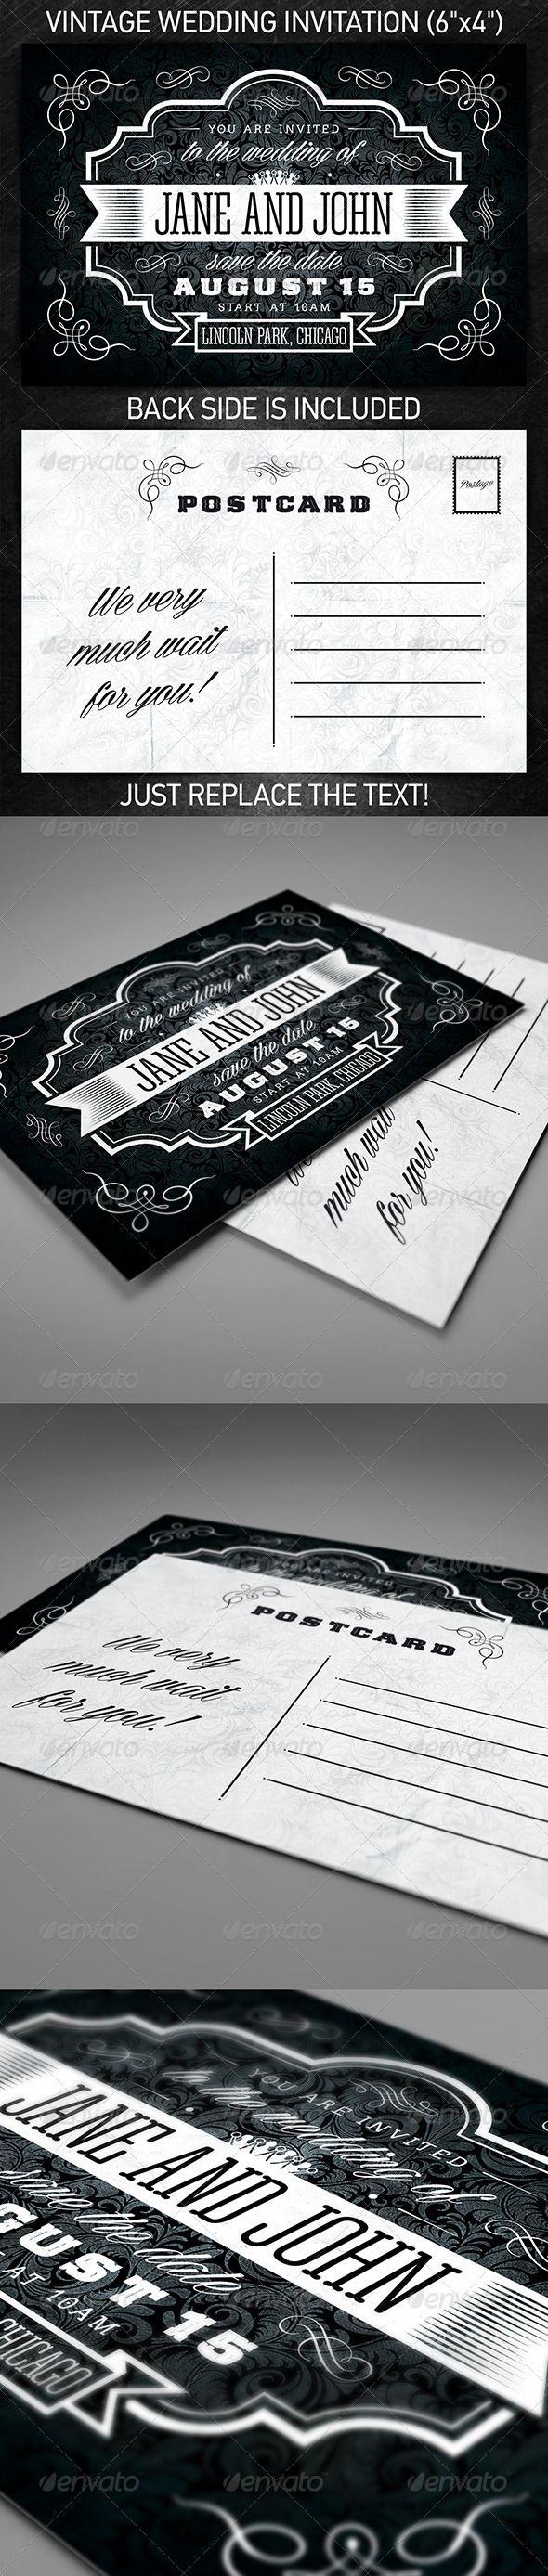 wedding invitation design psd%0A Vintage Wedding Invitation